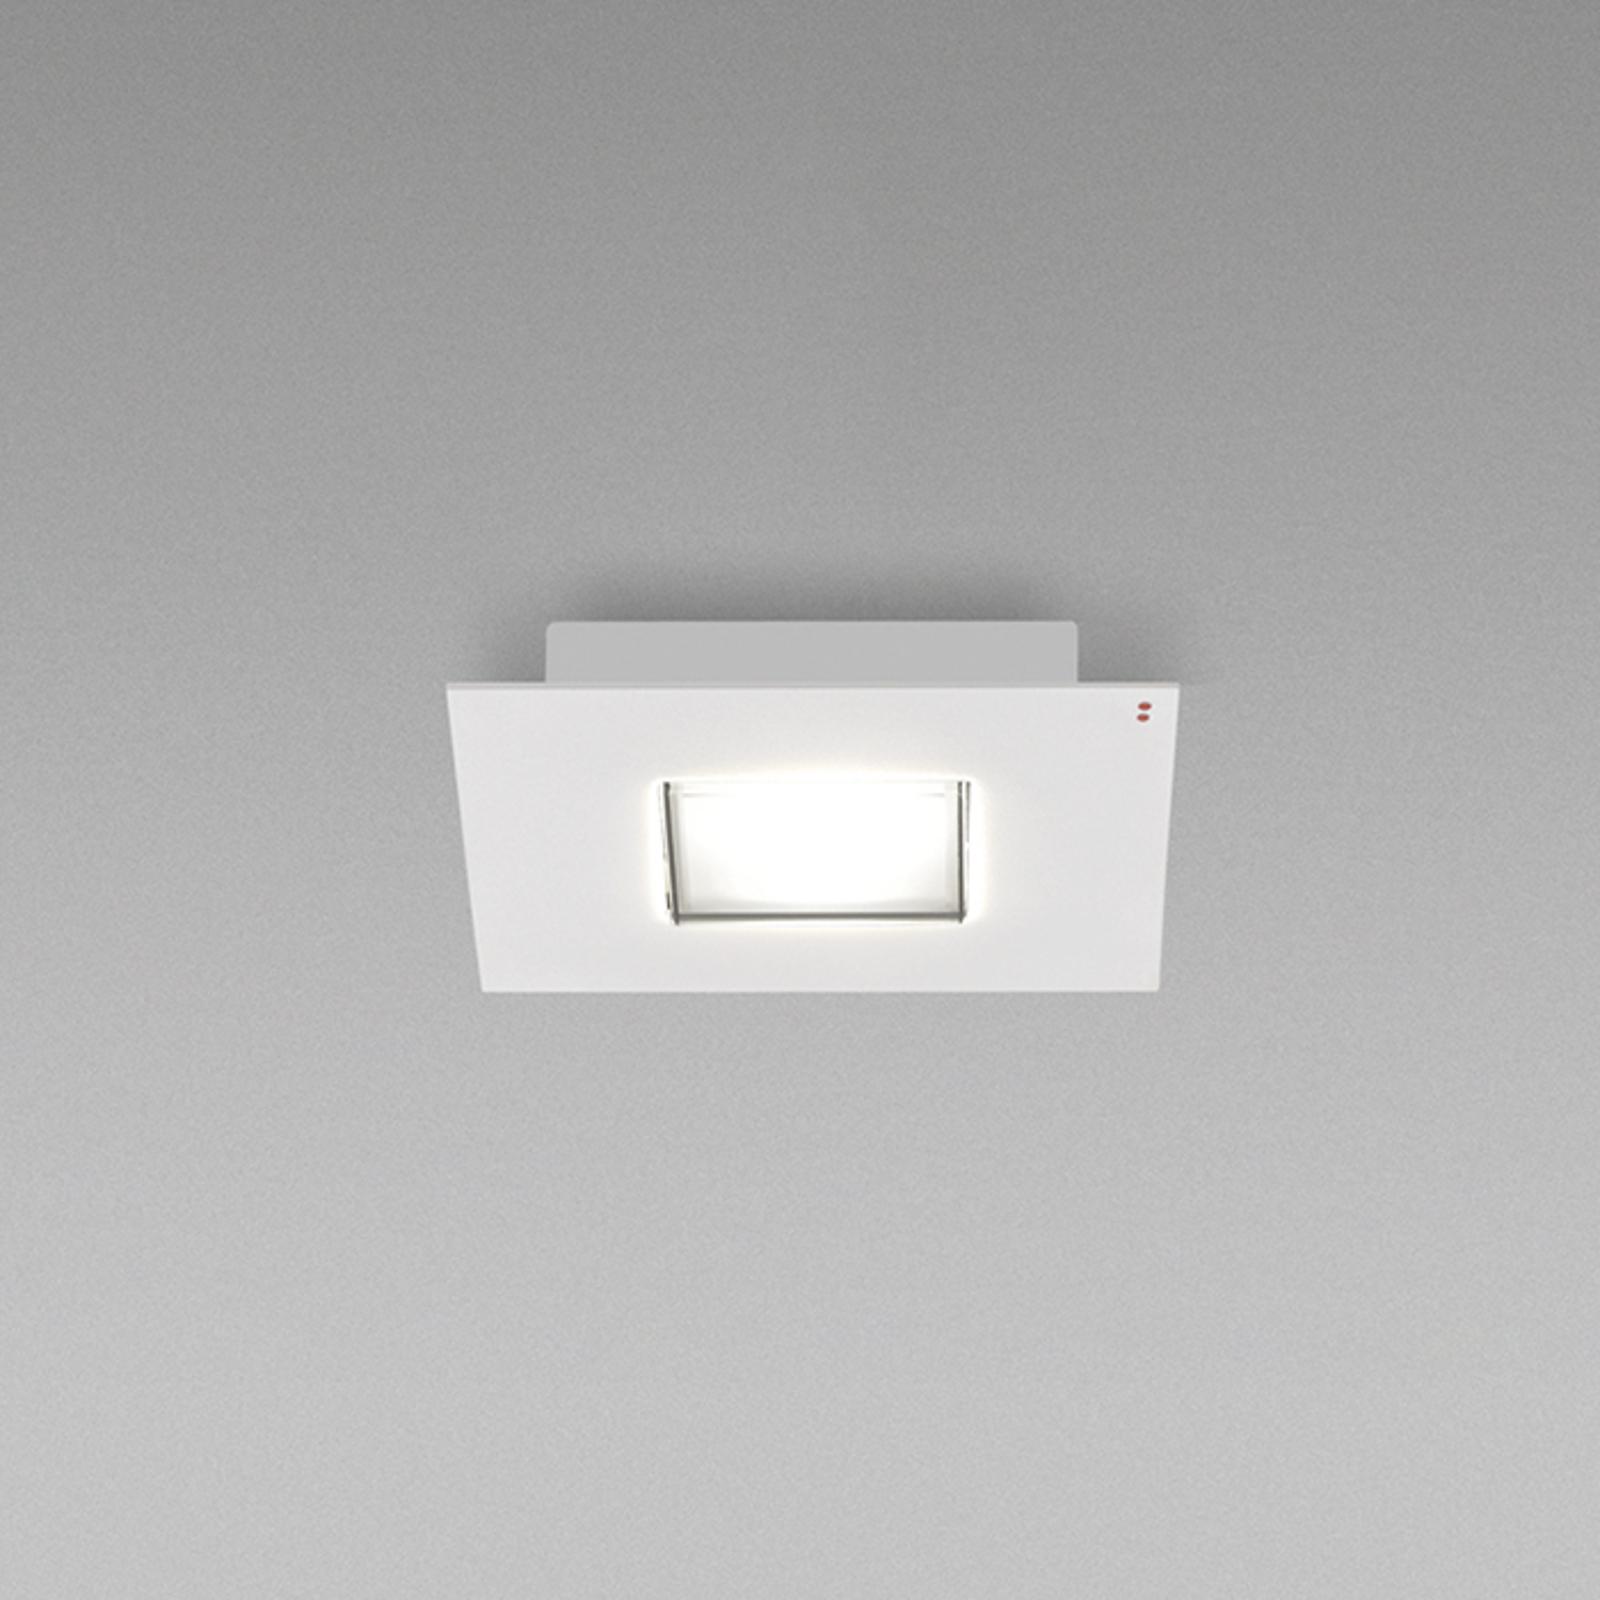 Fabbian Quarter - kvadratisk LED-taklampe